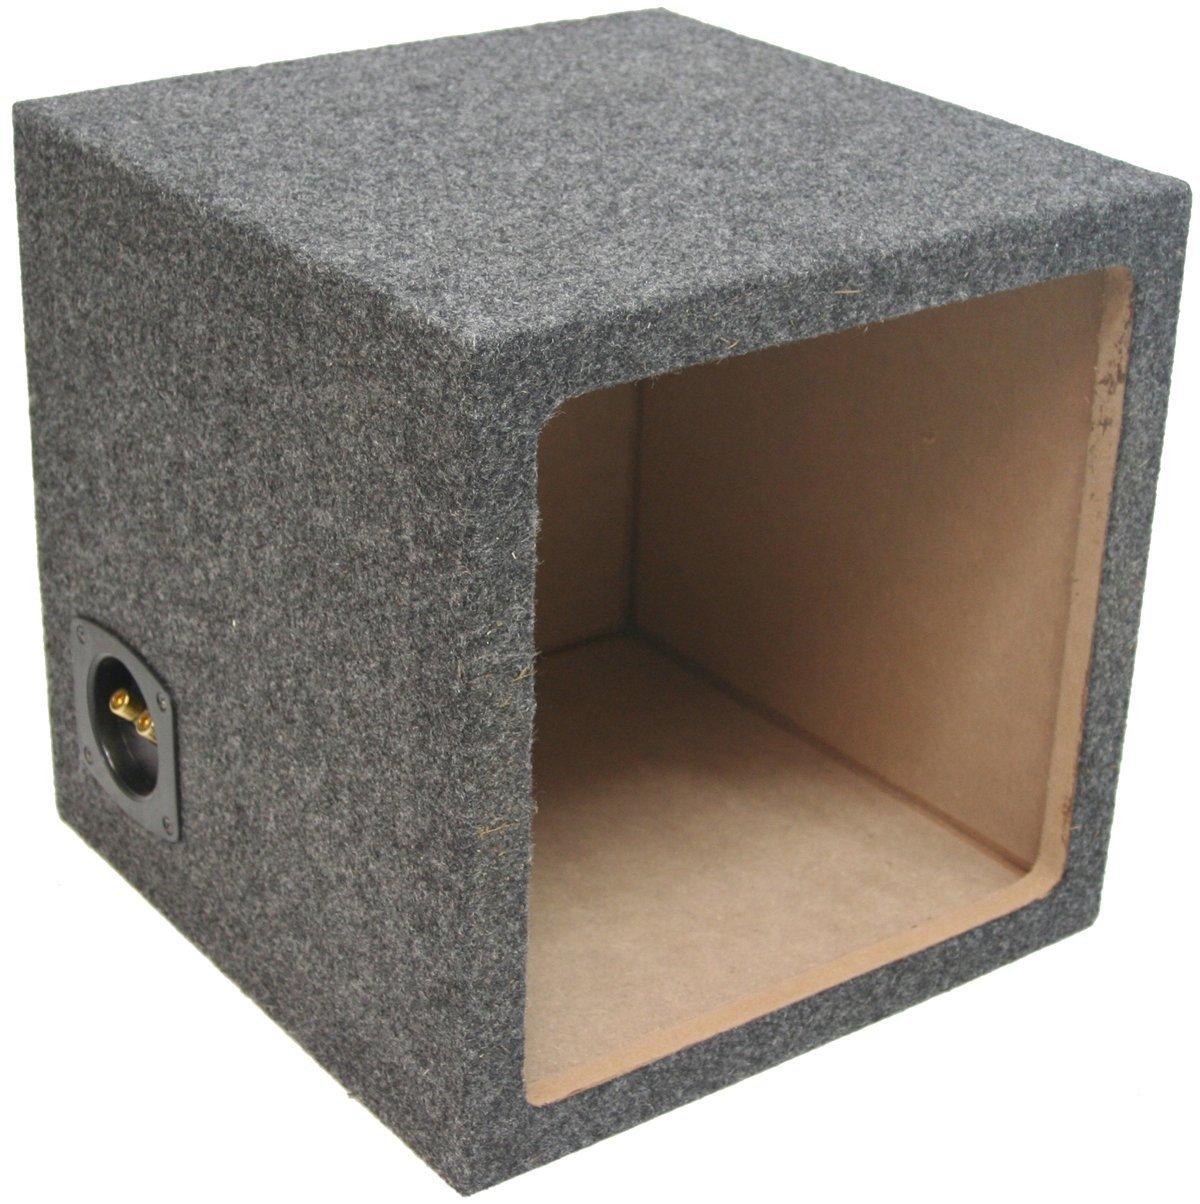 kicker 11s12l72 12 inch 1500w 2 ohm car. Black Bedroom Furniture Sets. Home Design Ideas